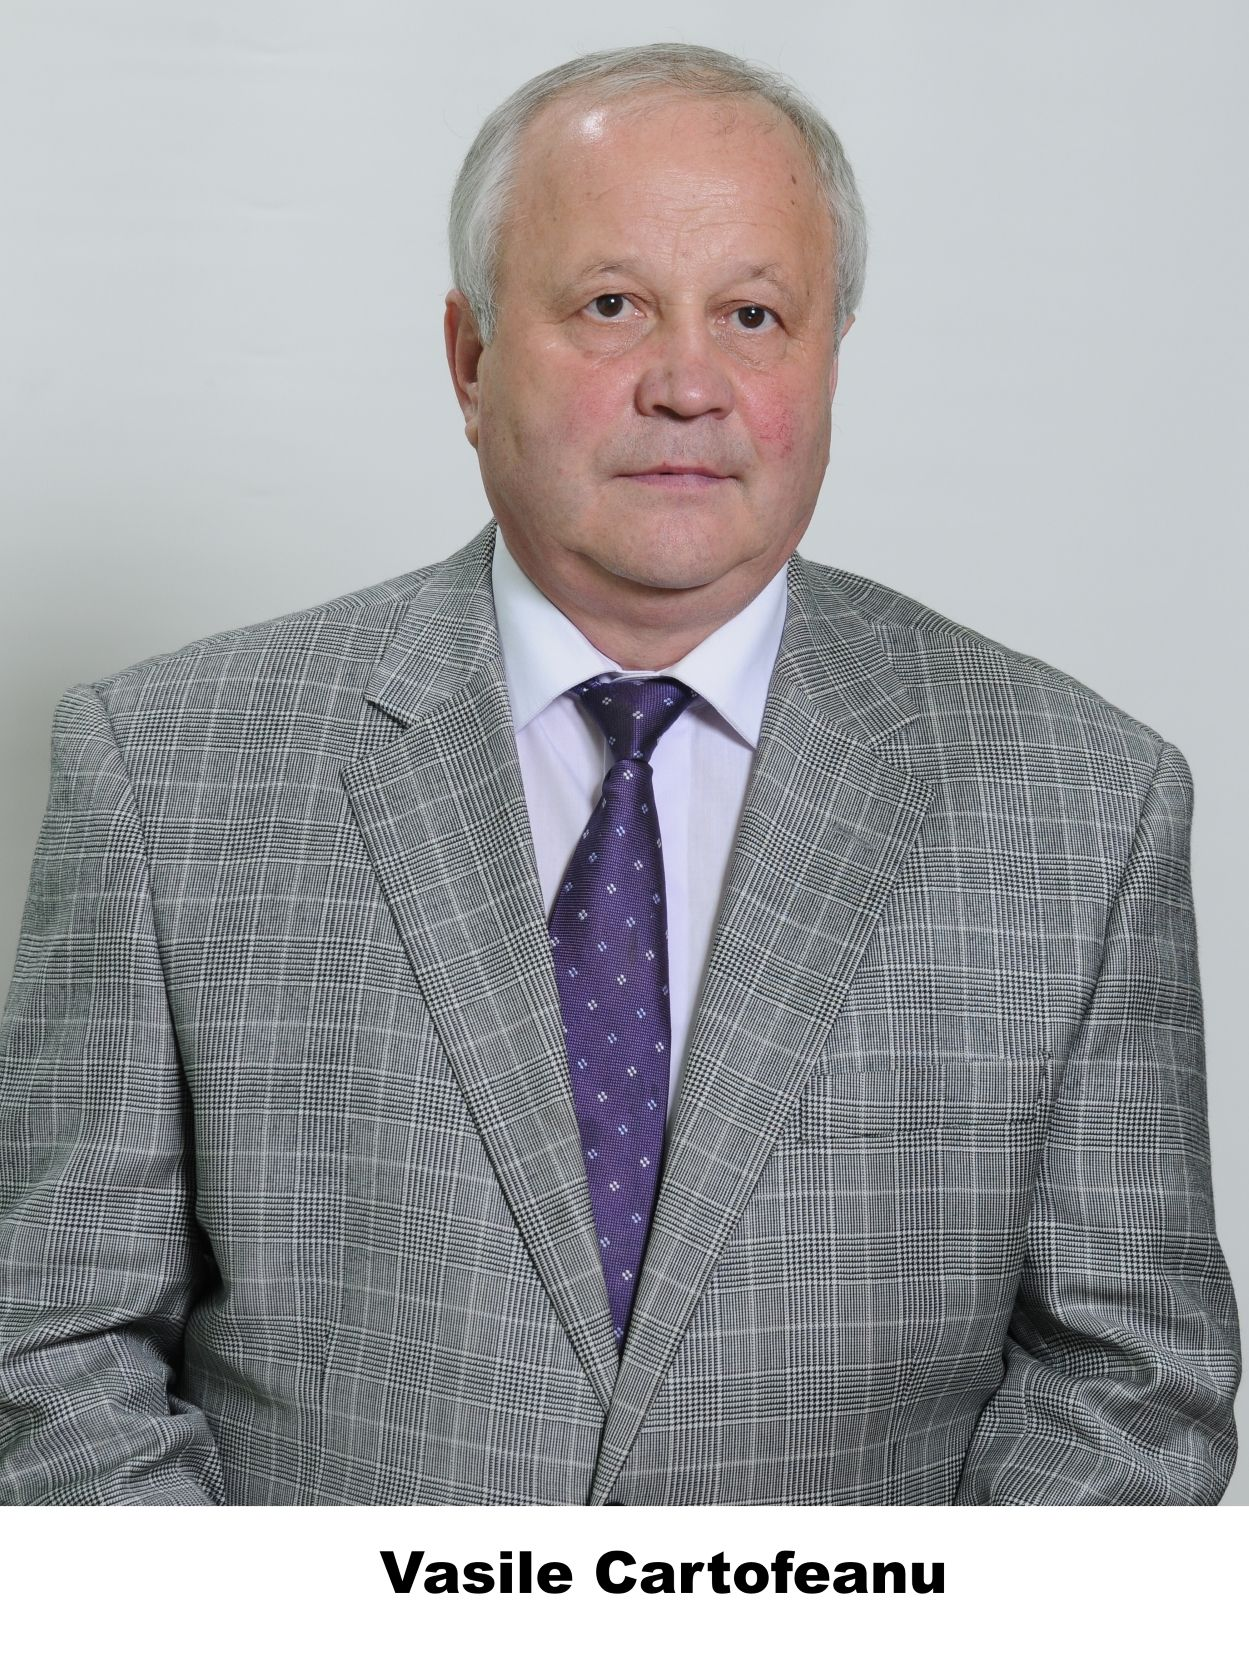 Vasile Cartofeanu